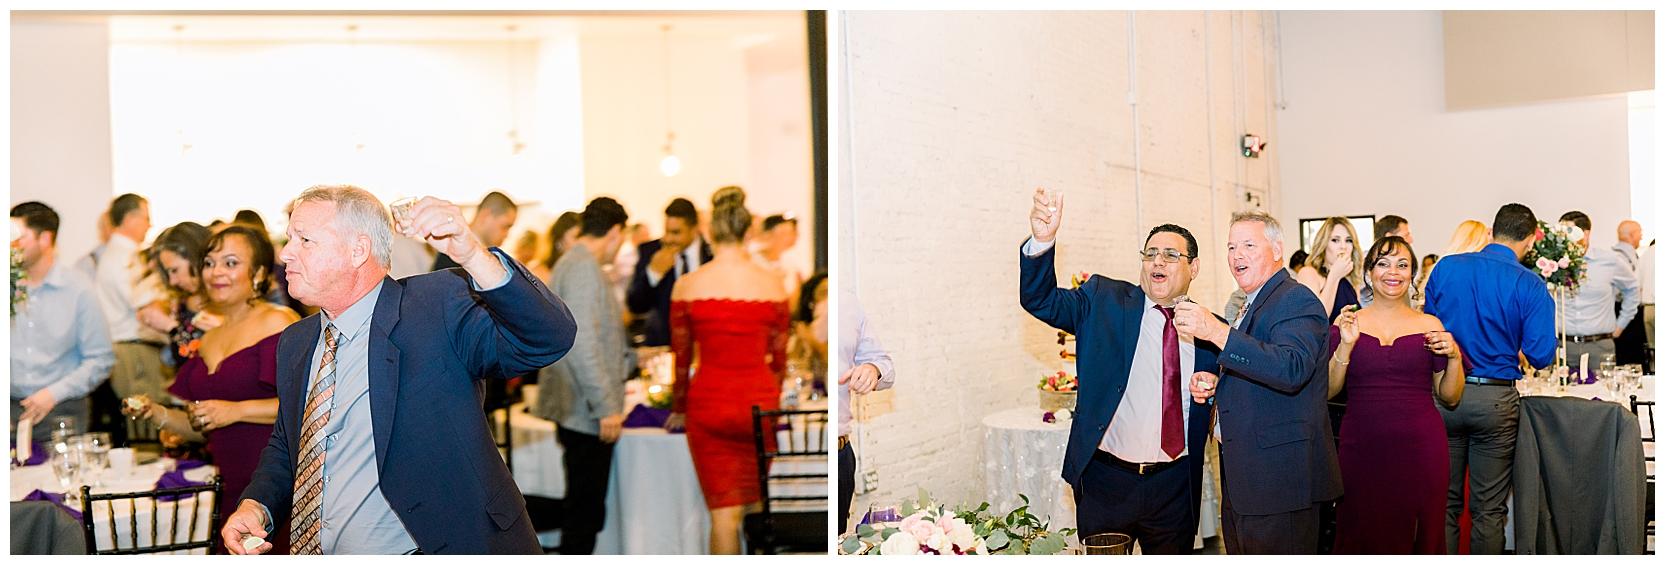 jessicafredericks_lakeland_tampa_wedding_purple_crazy hour_0082.jpg